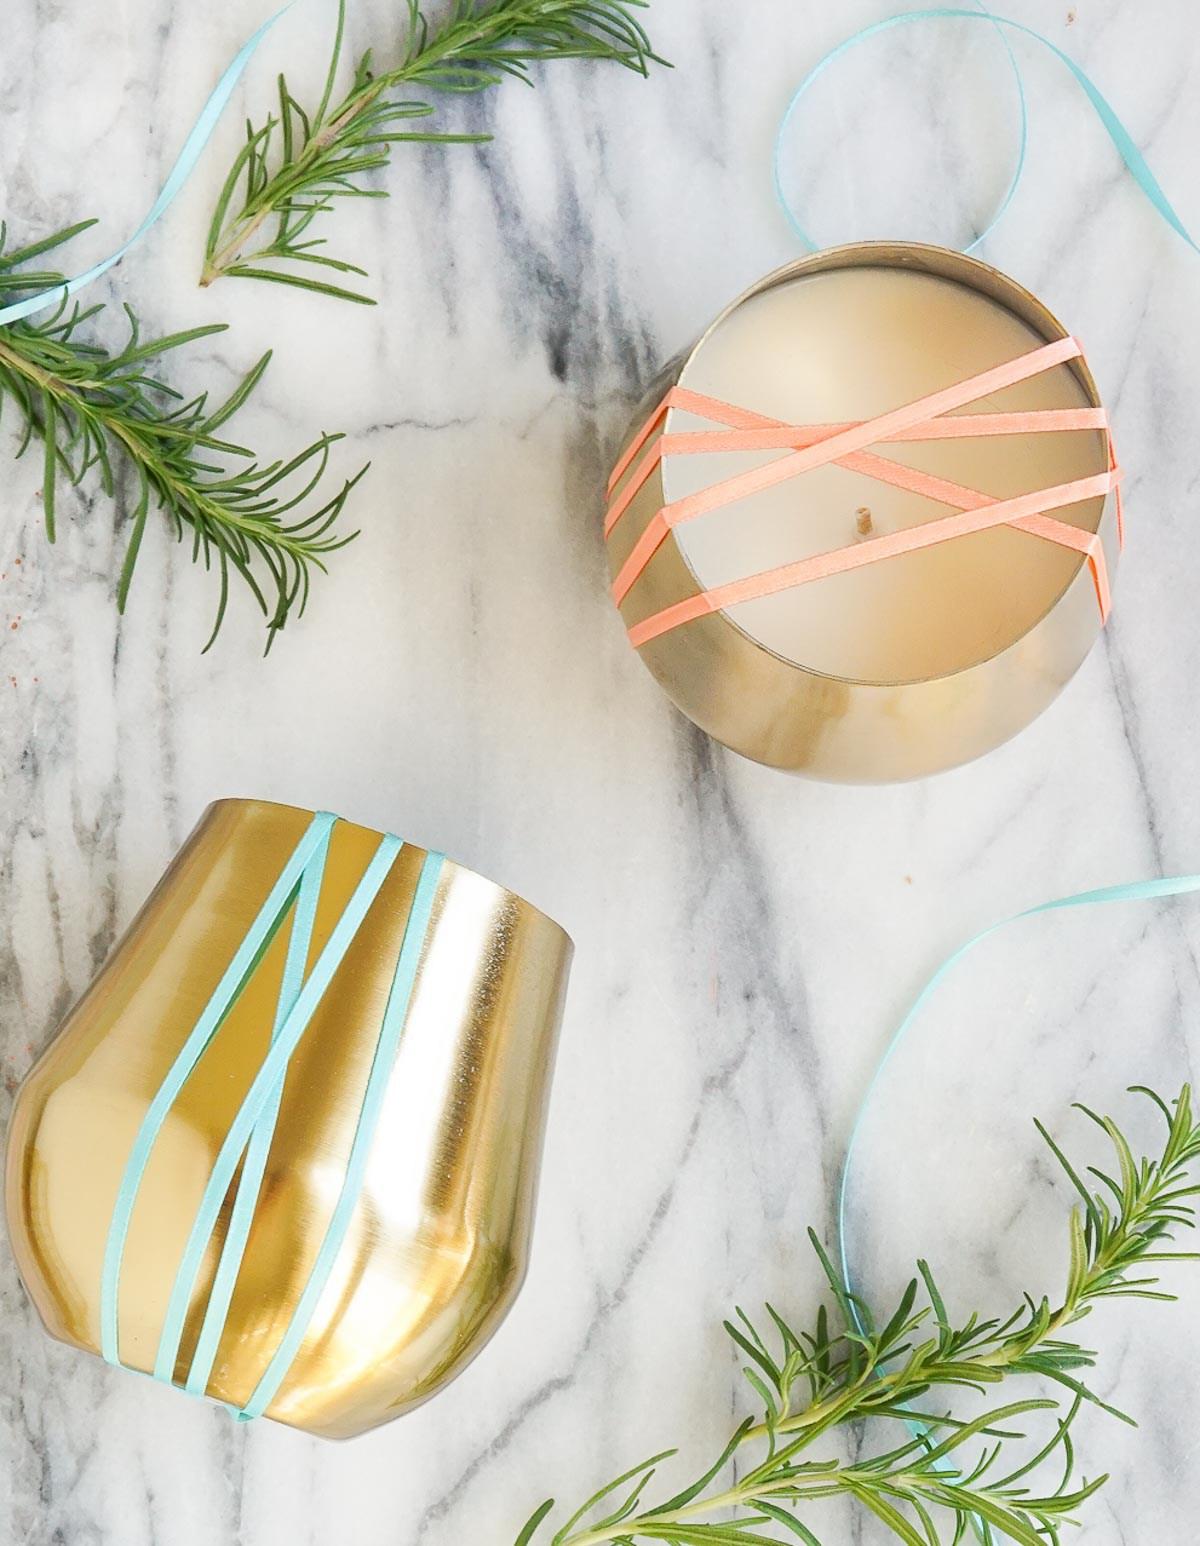 DIY candles from Sugar & Cloth